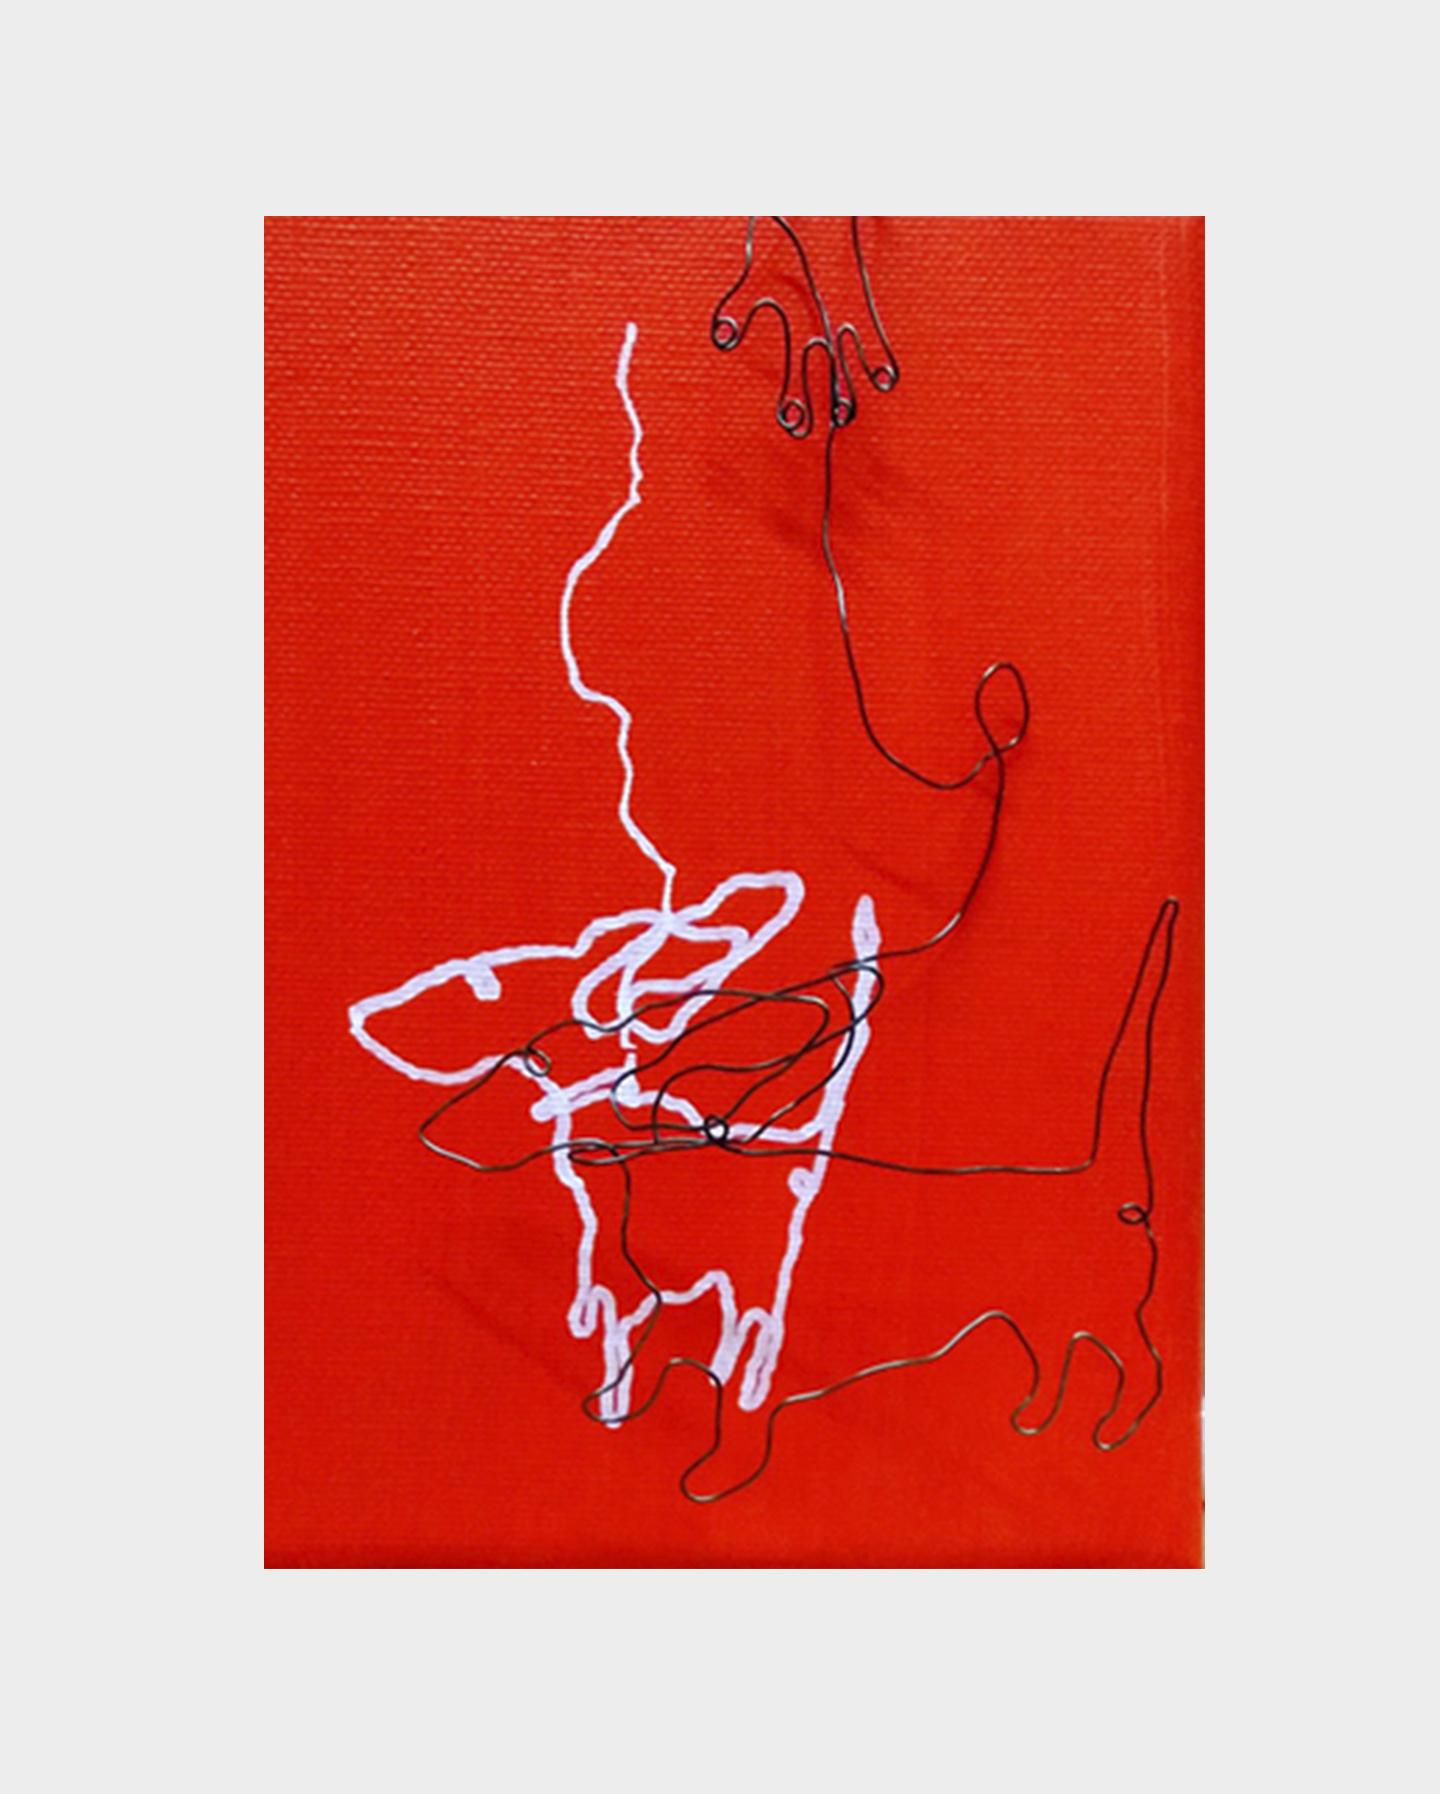 ik_wou_dat_ik_twee_hondjes_wasIII, 12 x 18 cm, 2020